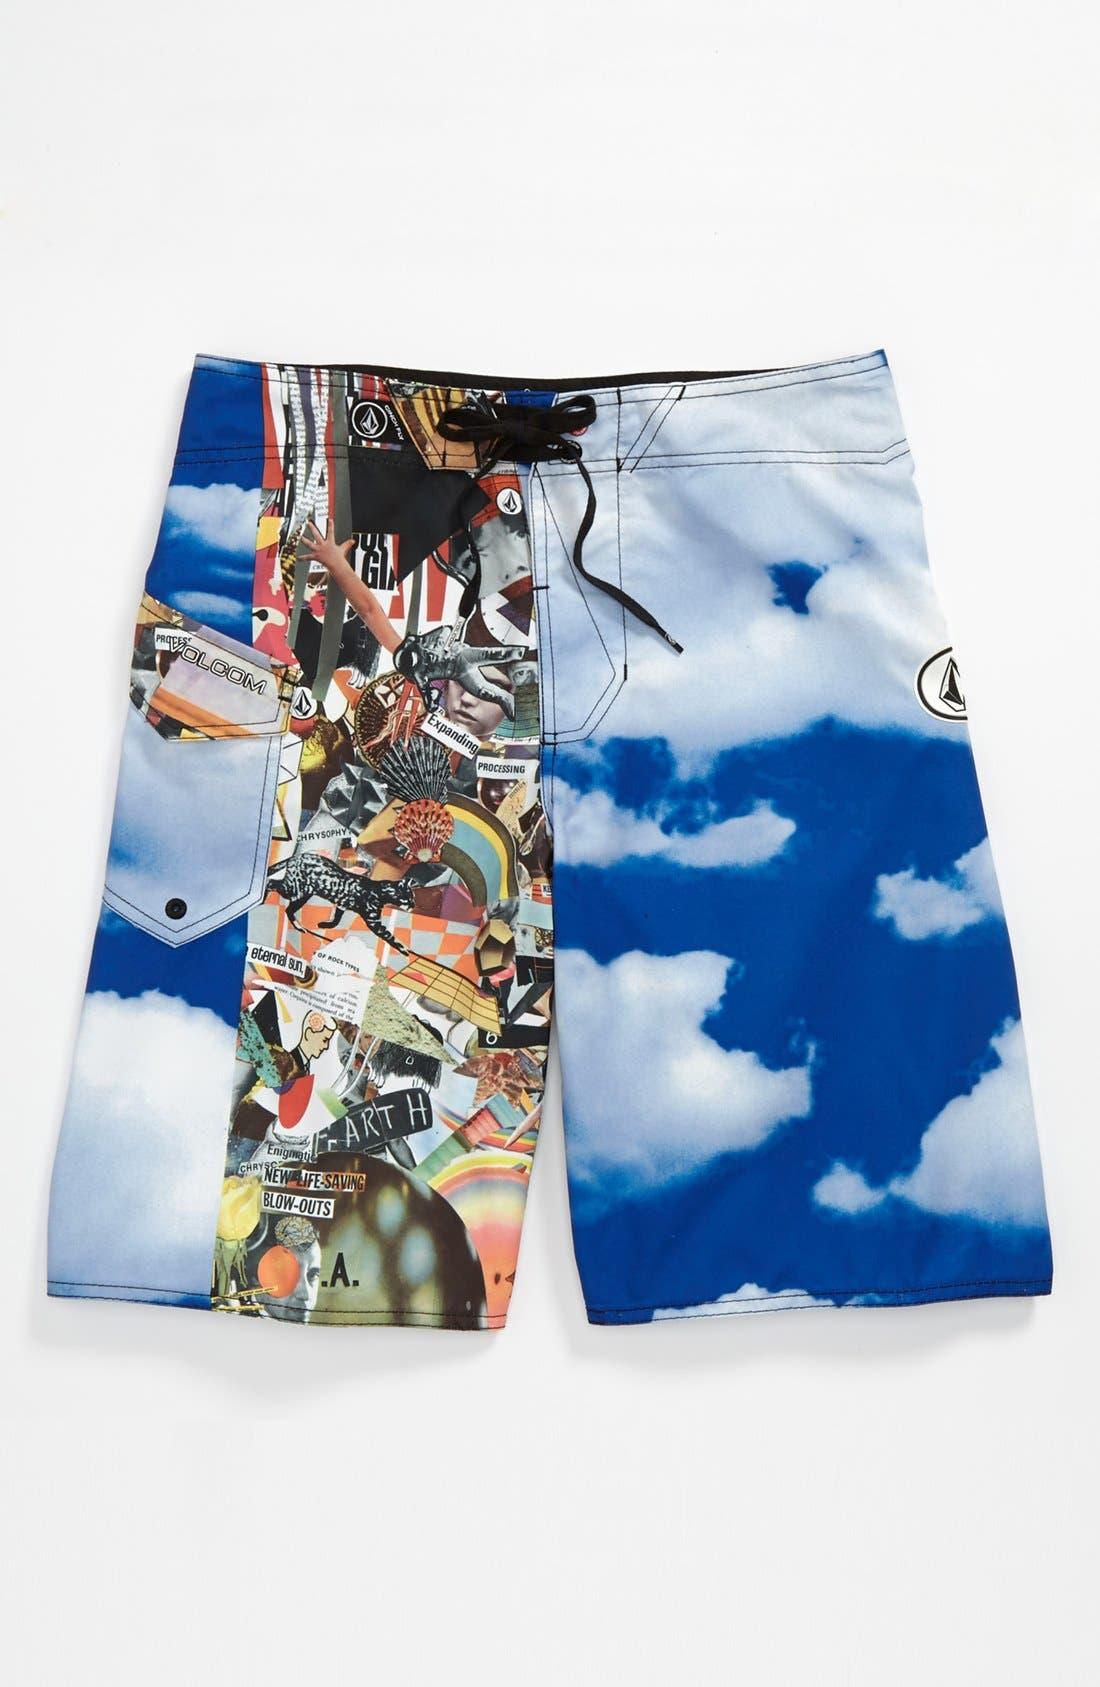 Alternate Image 1 Selected - Volcom 'Barter' Board Shorts (Big Boys)